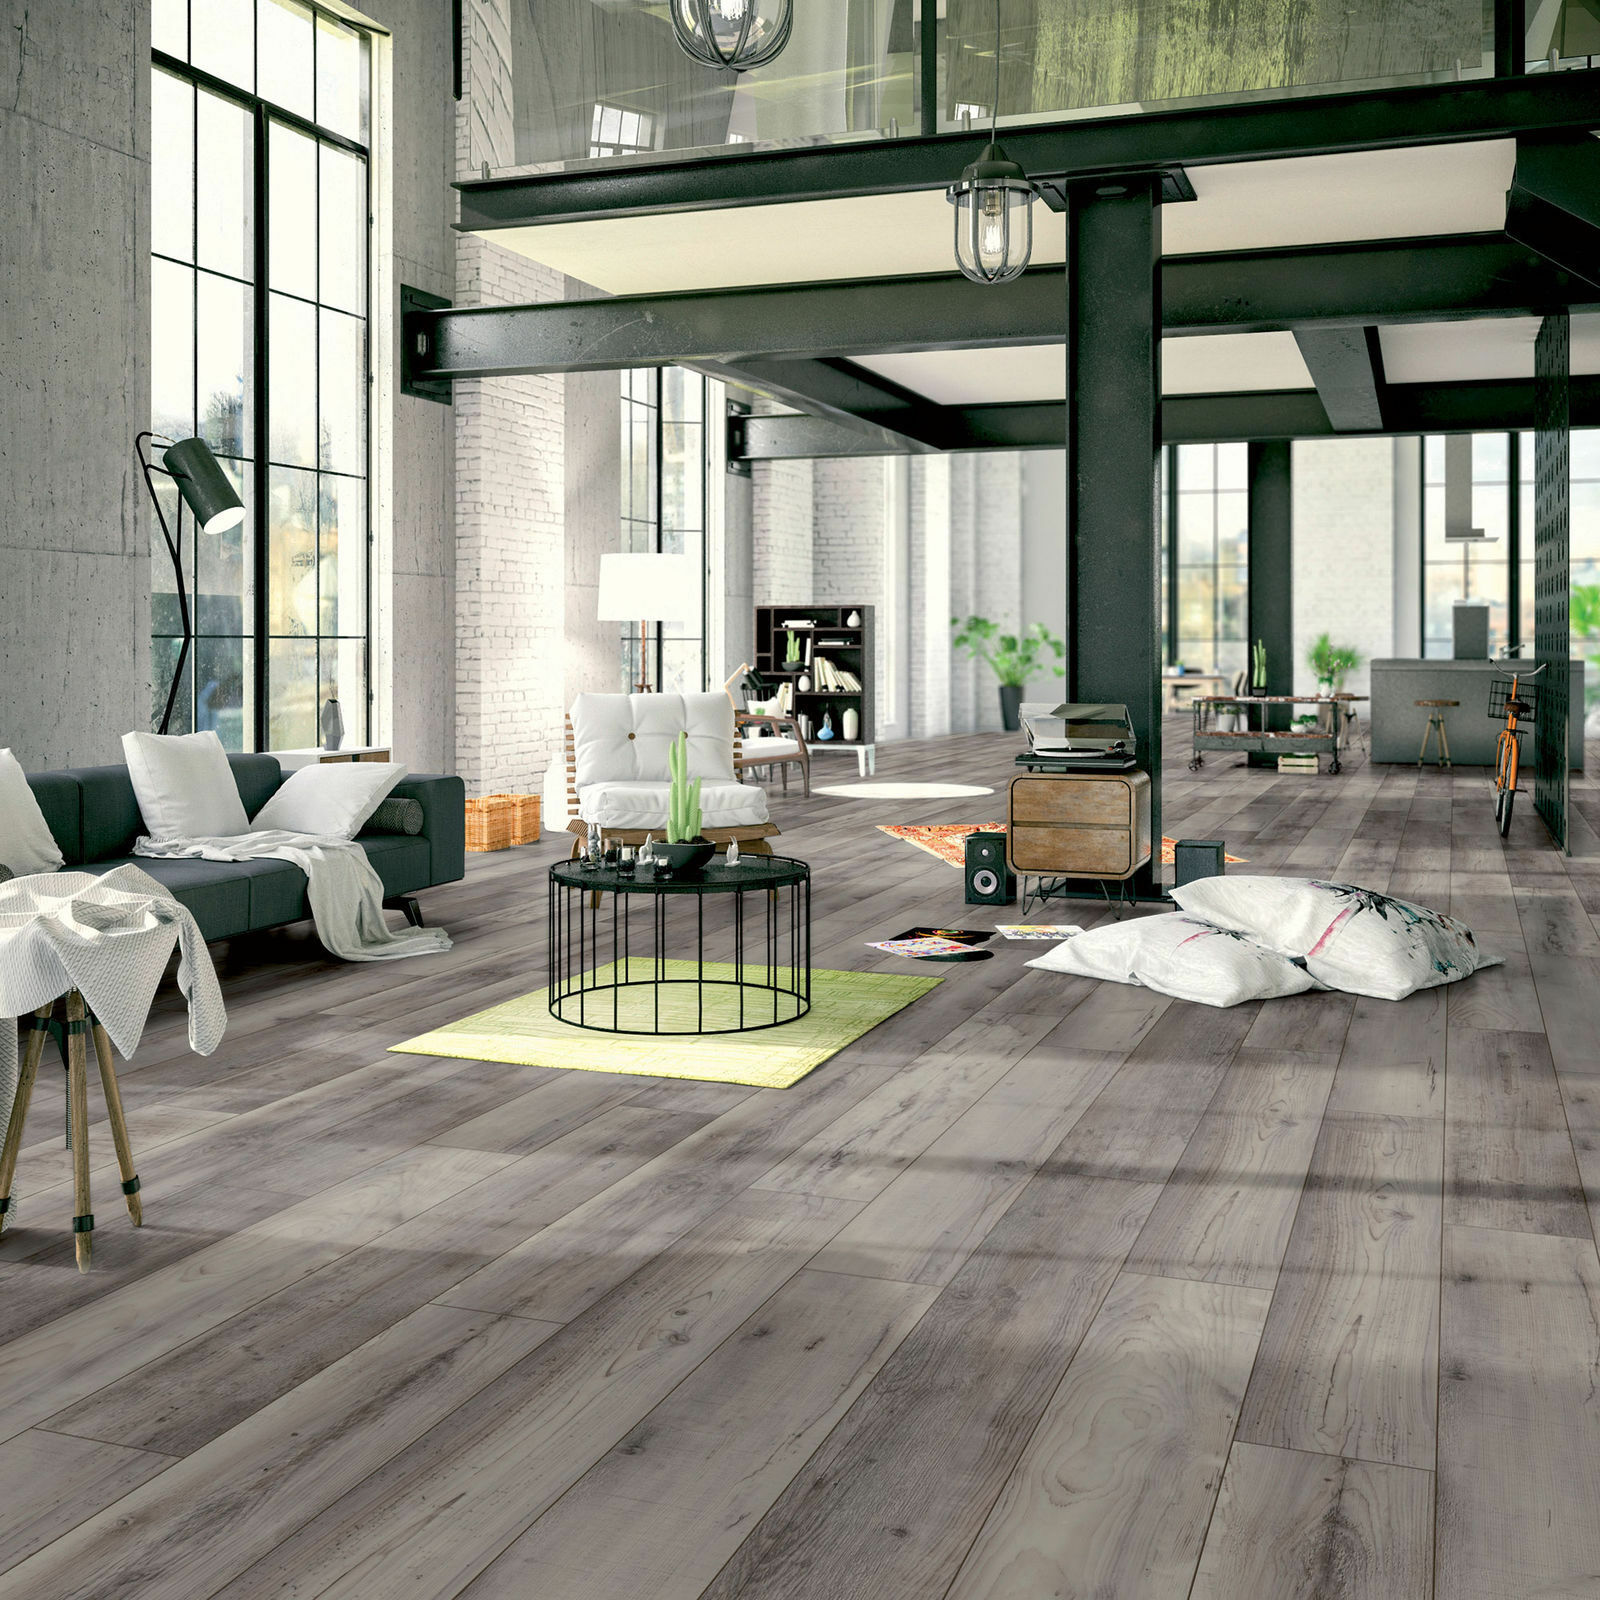 12mm Laminate Flooring KronoSwiss Minto Pine Textured Finish